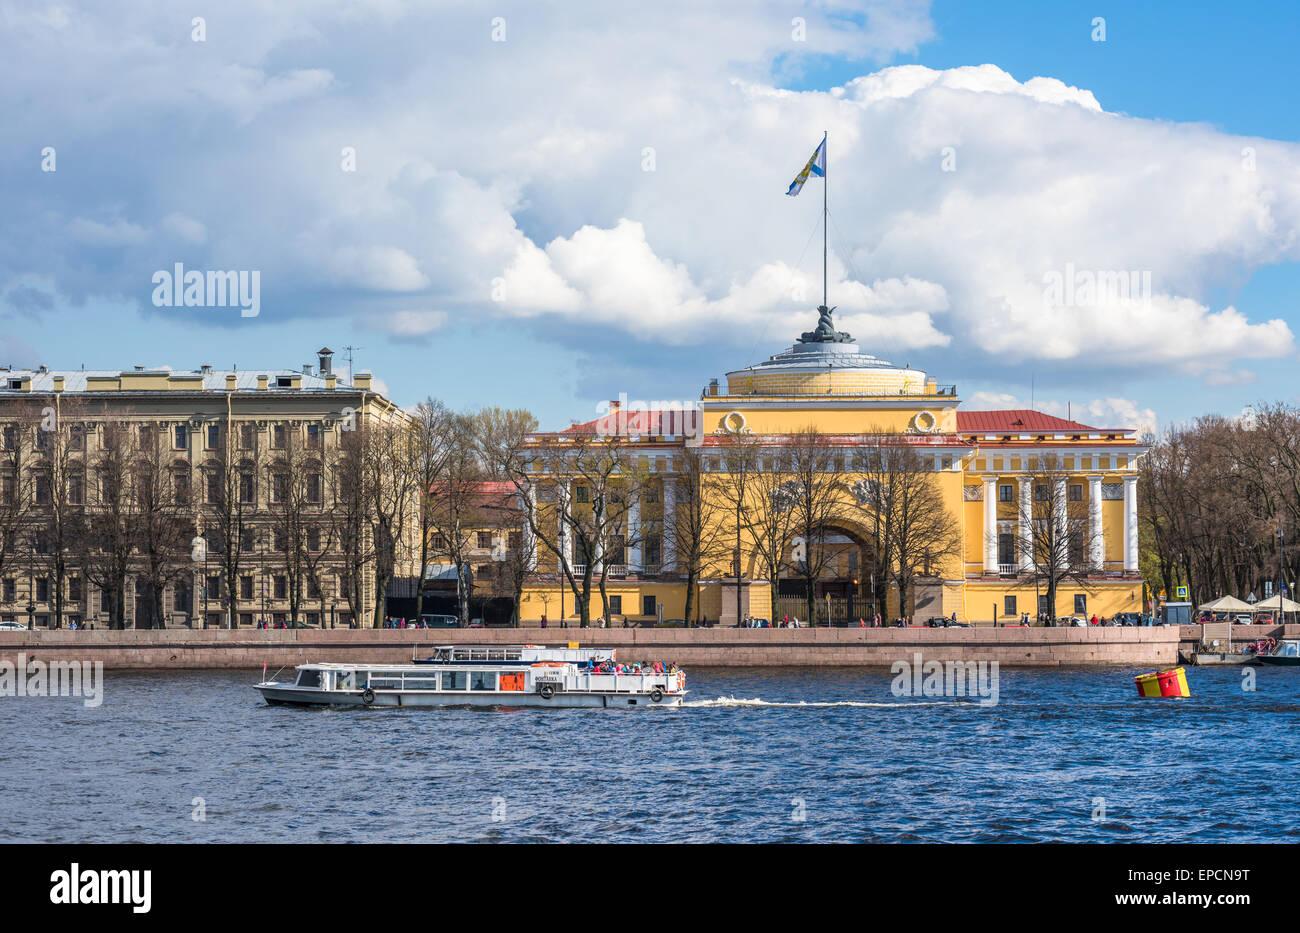 Admiralty building, Saint Petersburg, Russia - Stock Image